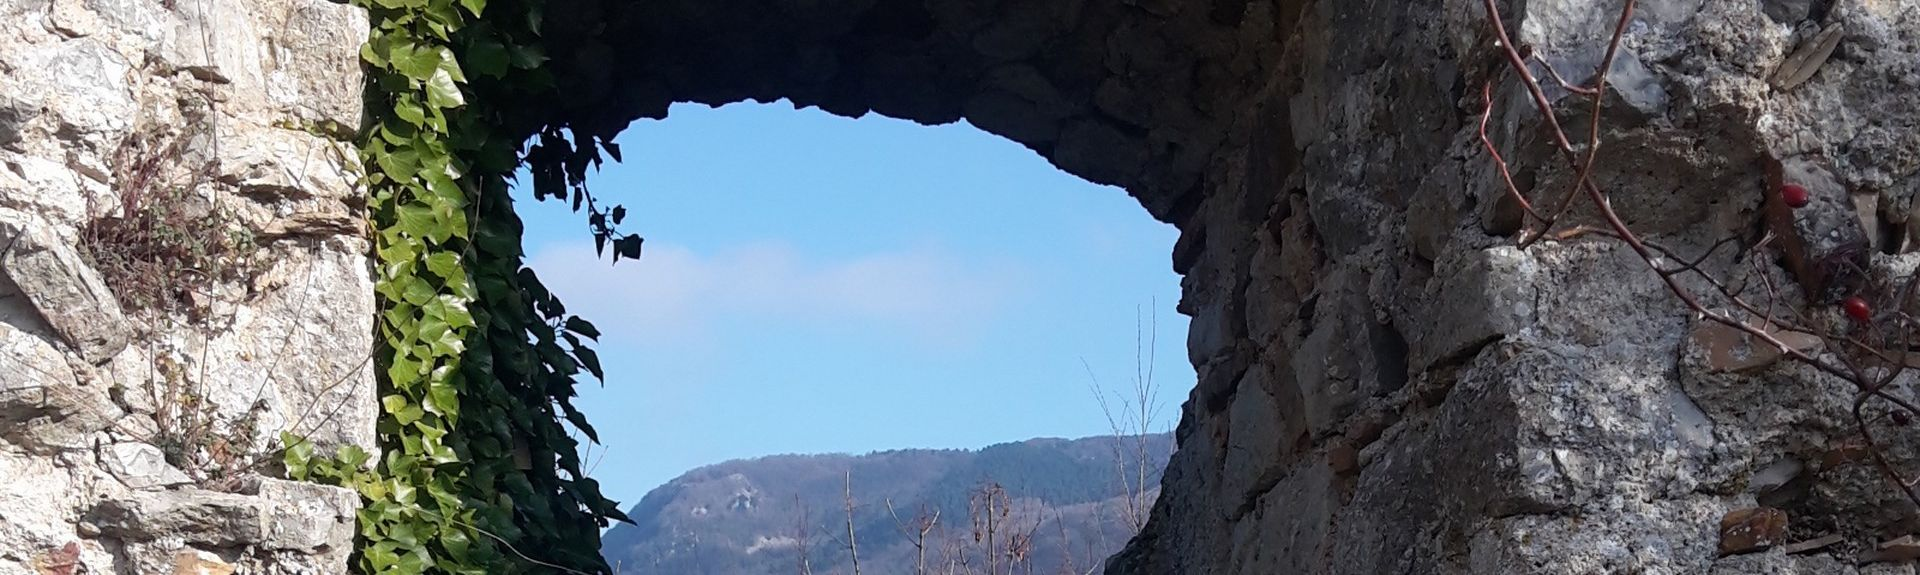 Roccalbegna, Grosseto, Tuscany, Italy